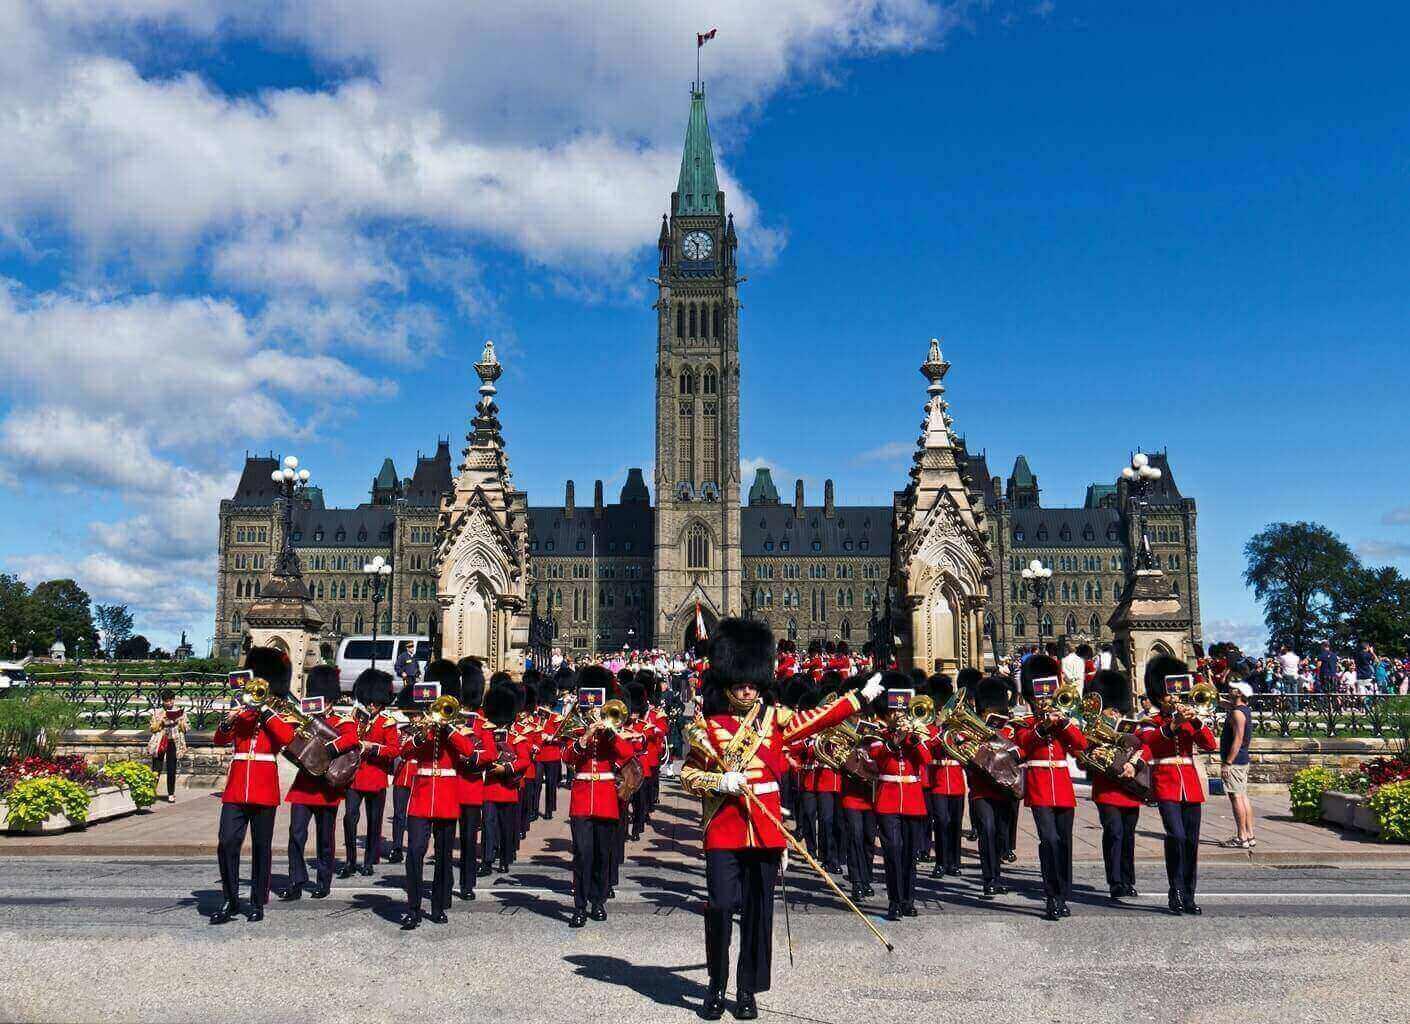 Parlement Ottawa Canada, relève de la garde